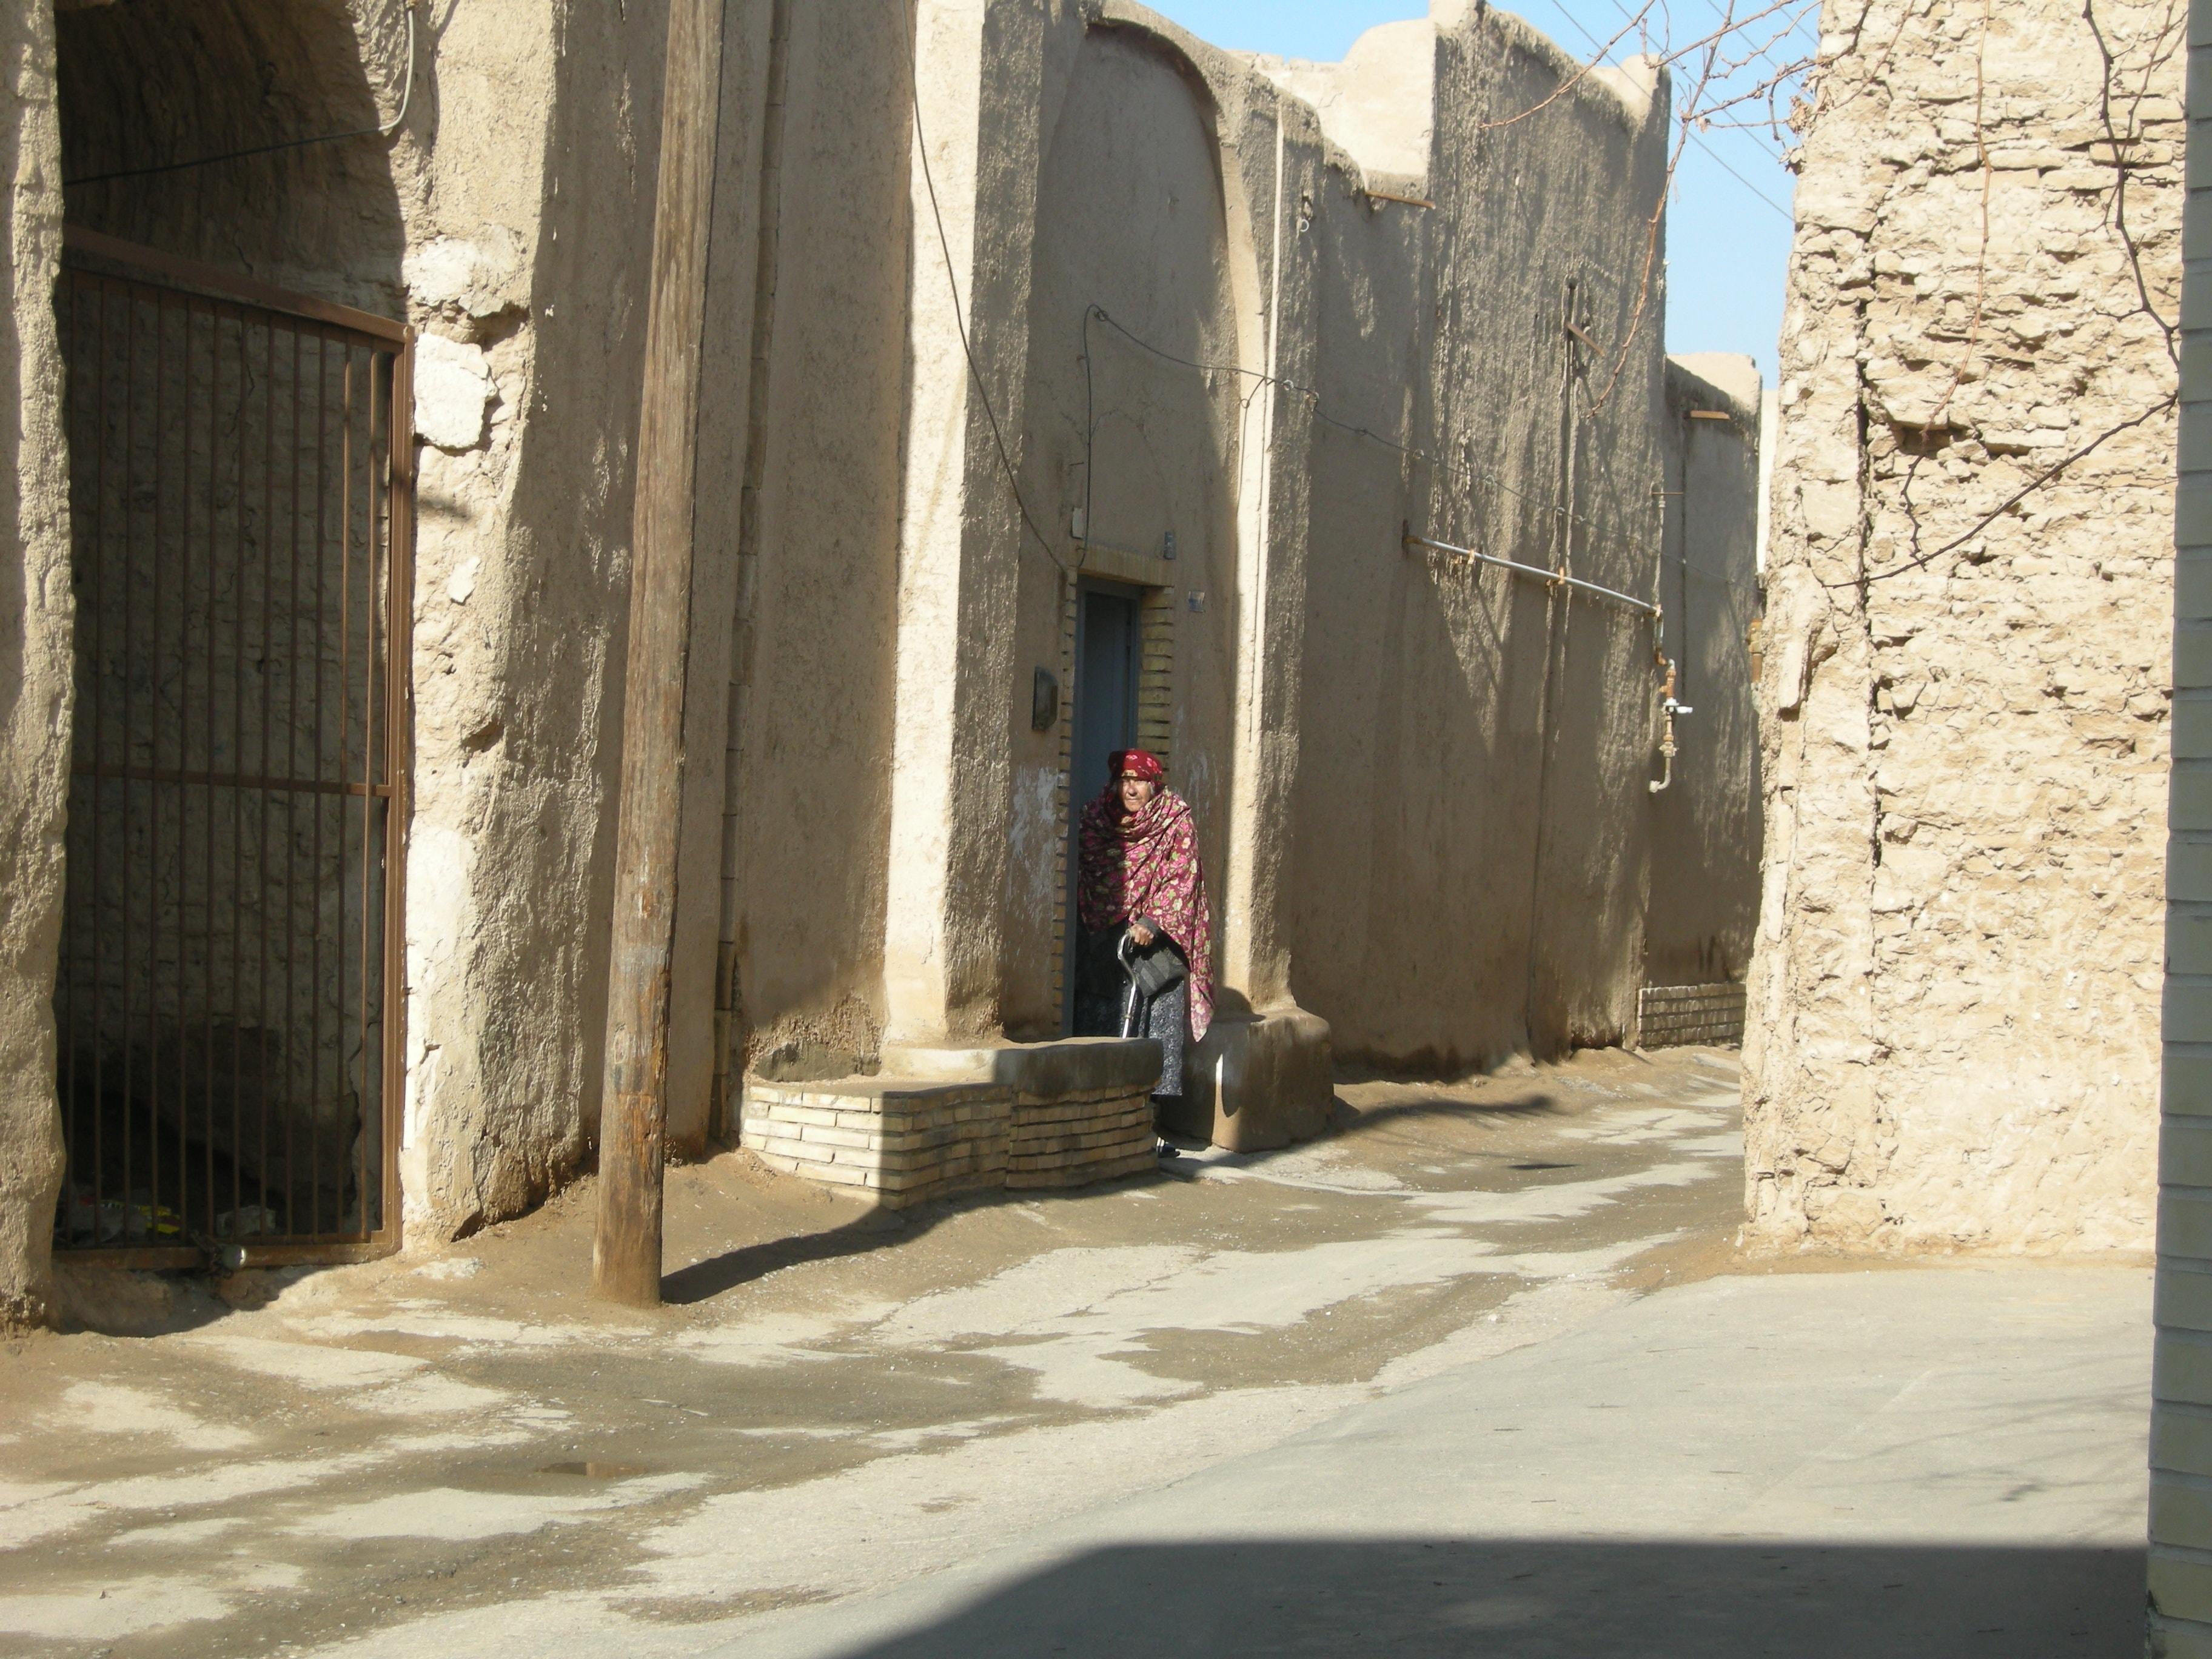 Benches are an element of the Zoroastrian neighborhood | © Pontia Fallahi